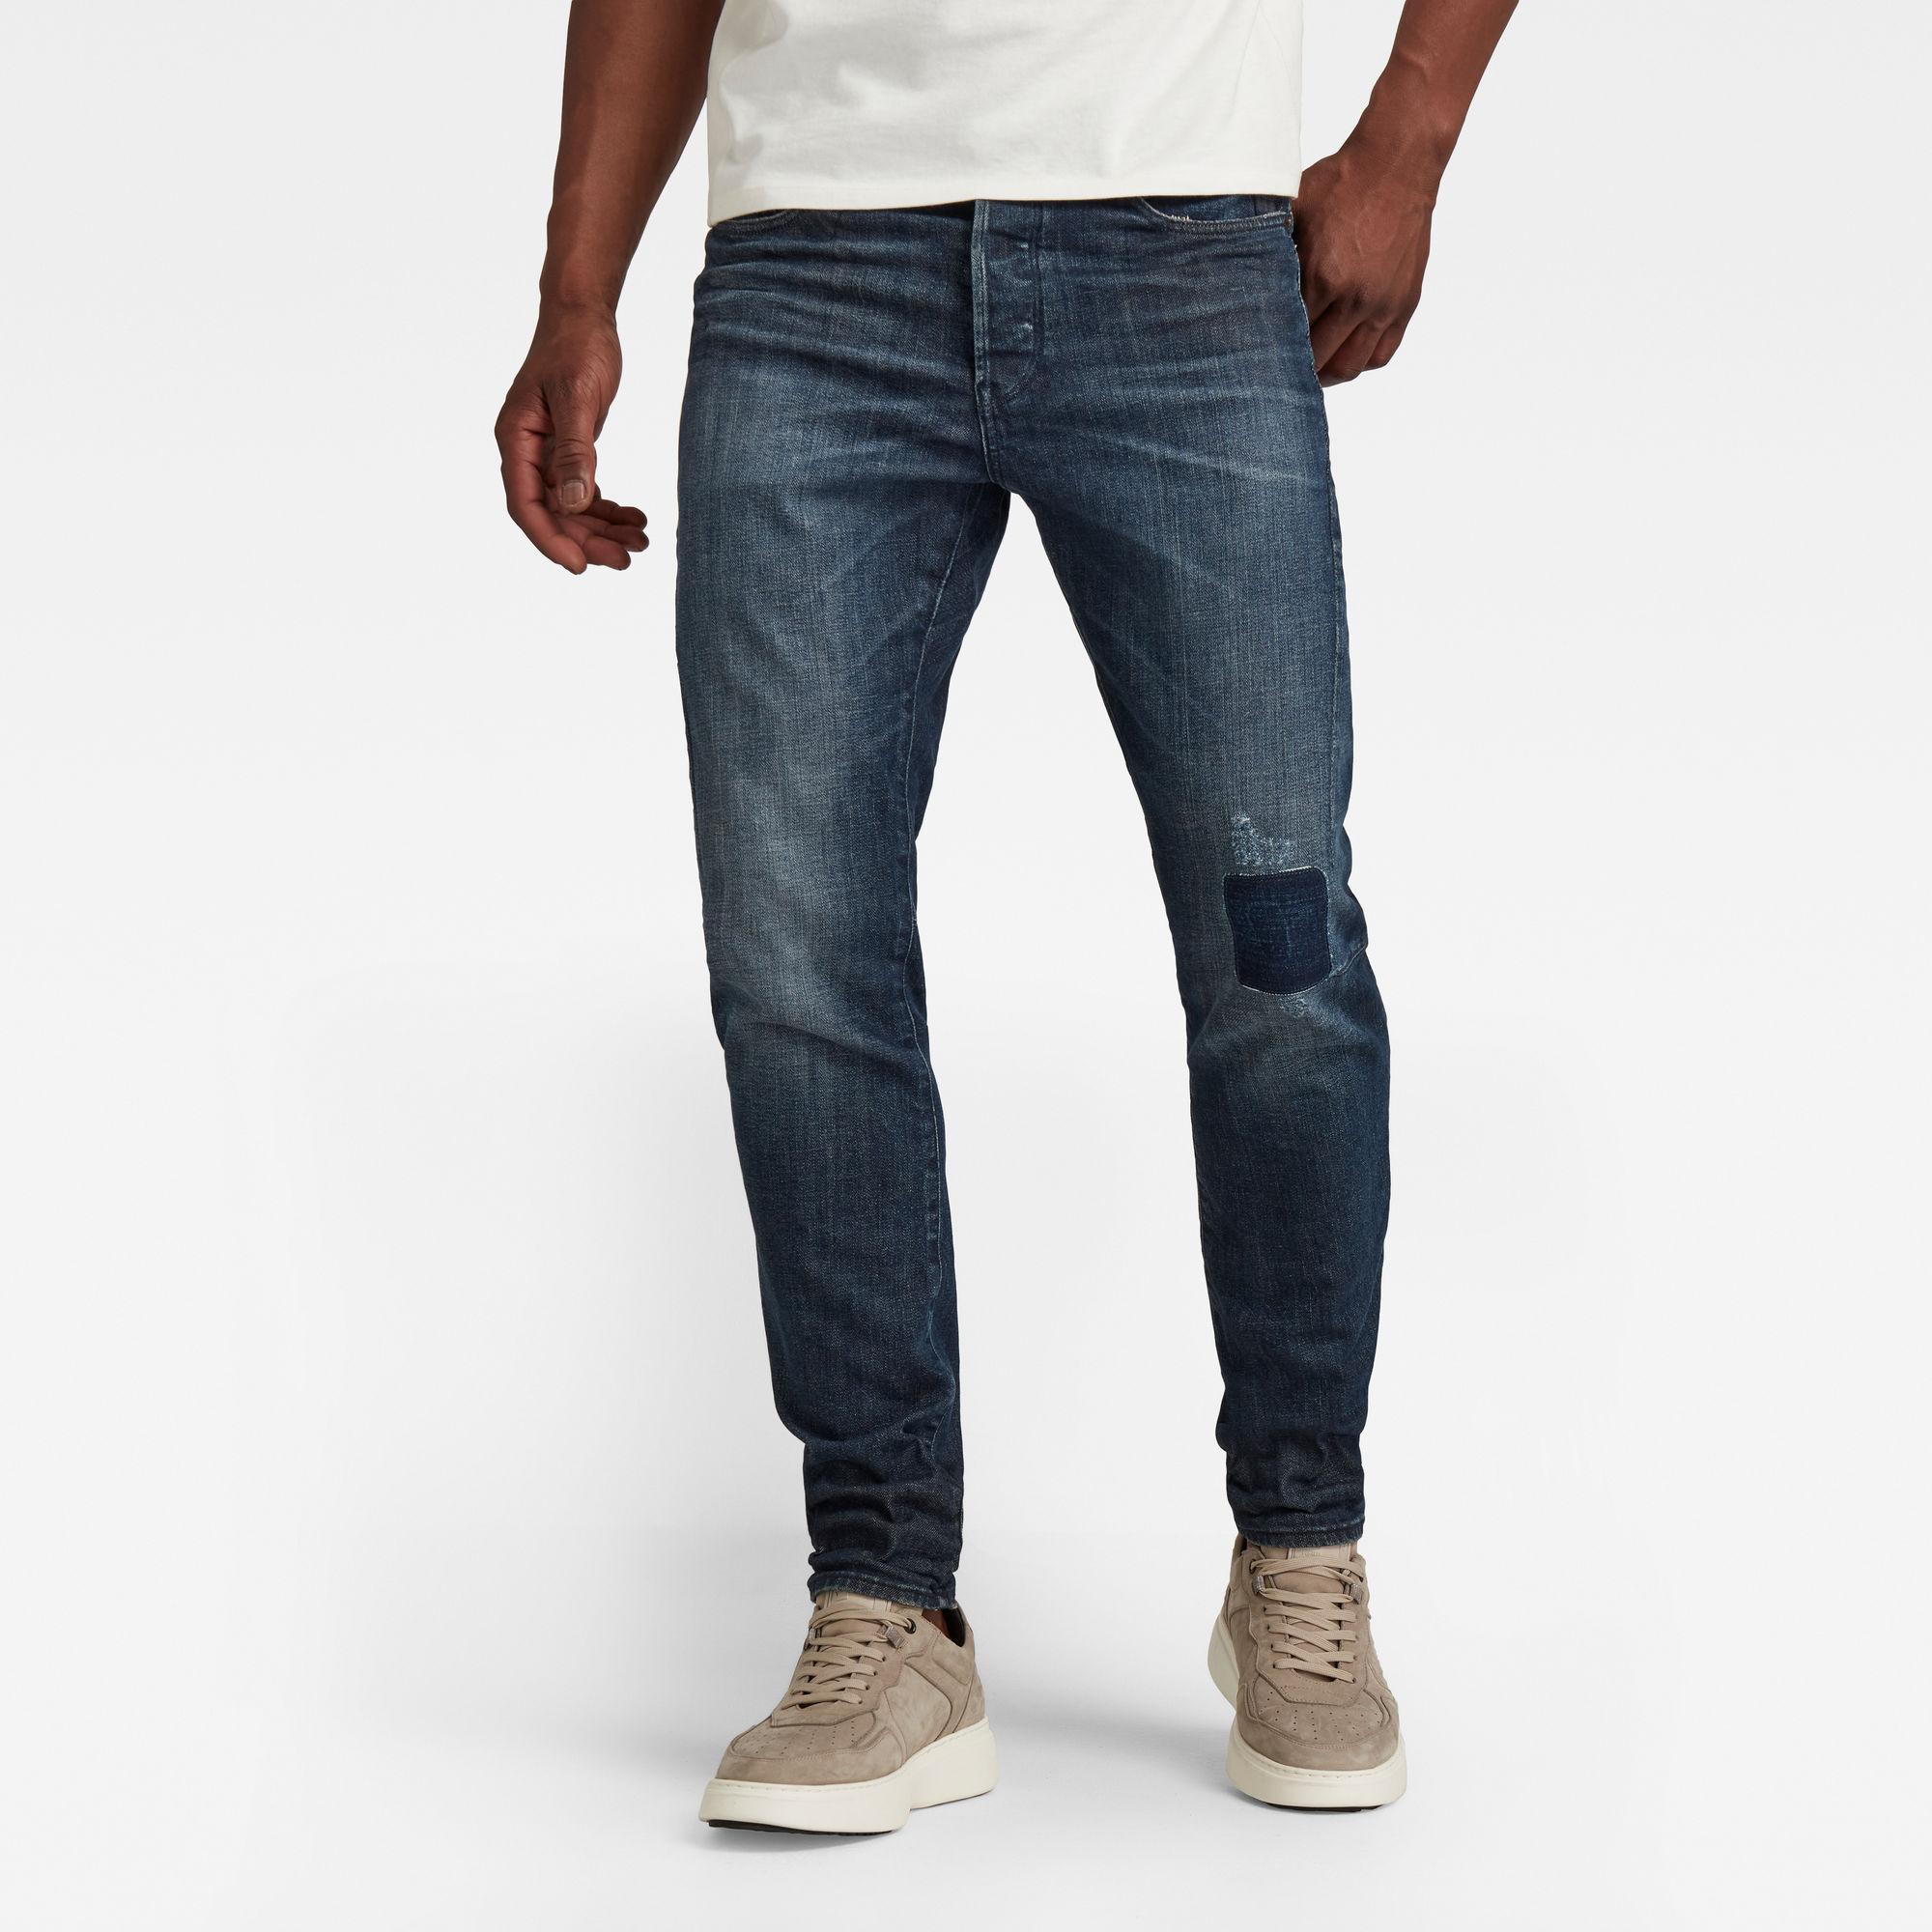 G-Star RAW Heren Scutar 3D Slim Jeans Donkerblauw